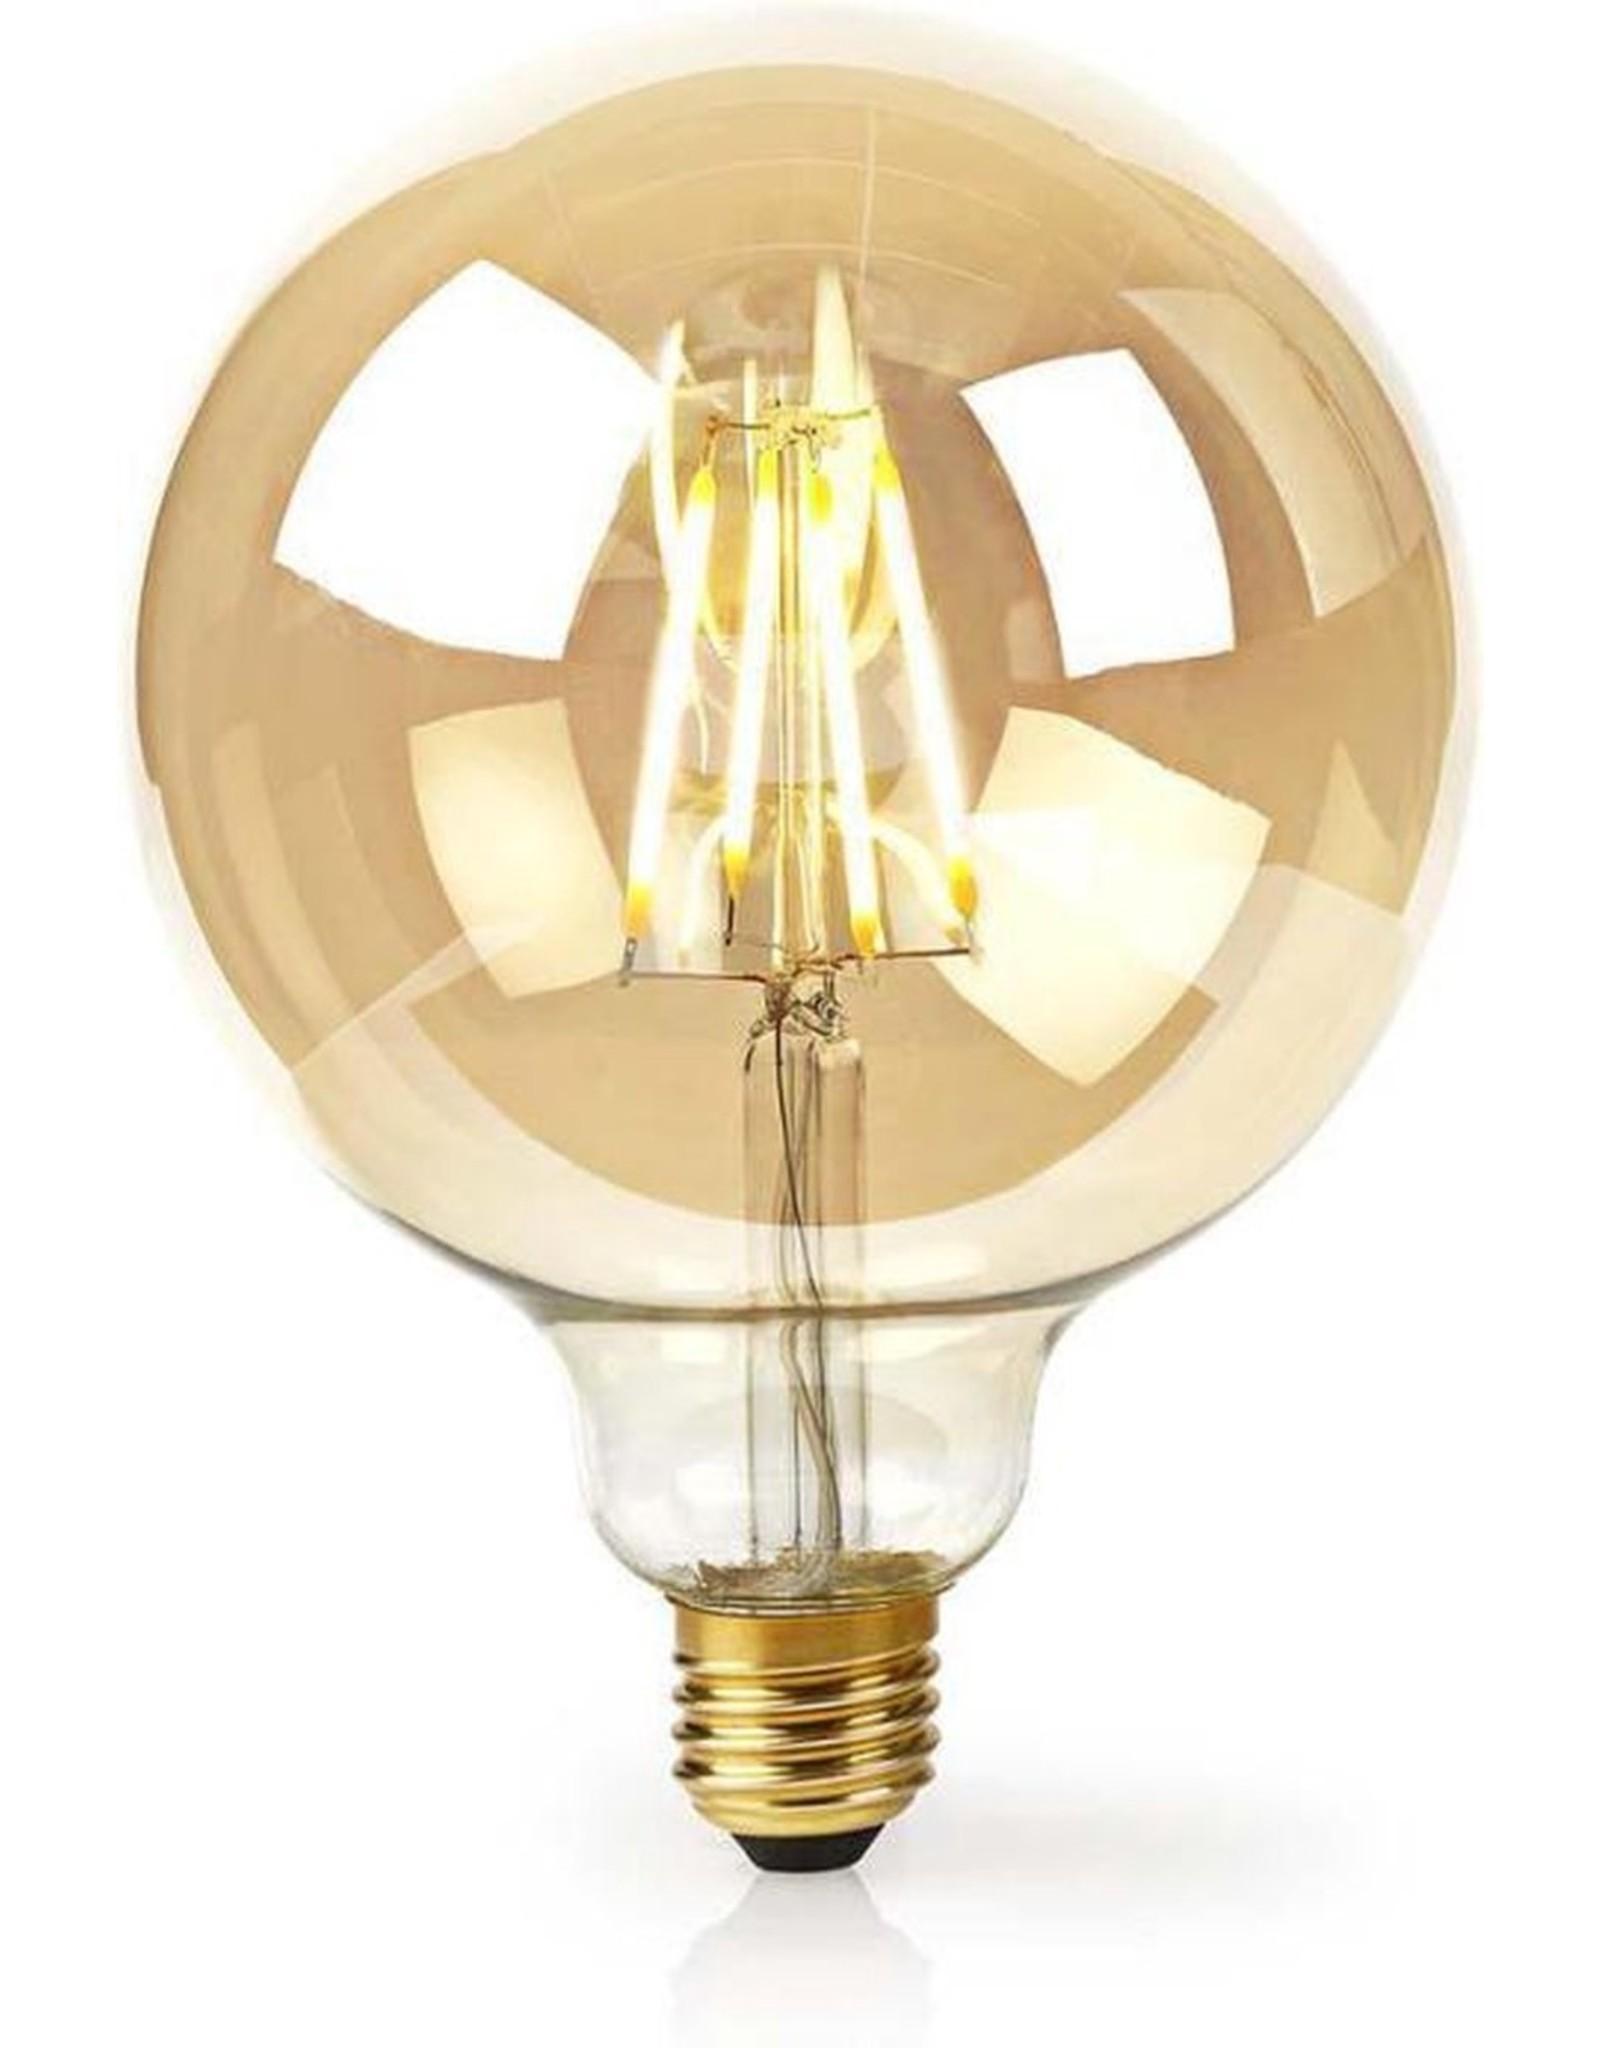 Nedis Nedis - Lamp - LED Filament  - Wi-Fi Smart